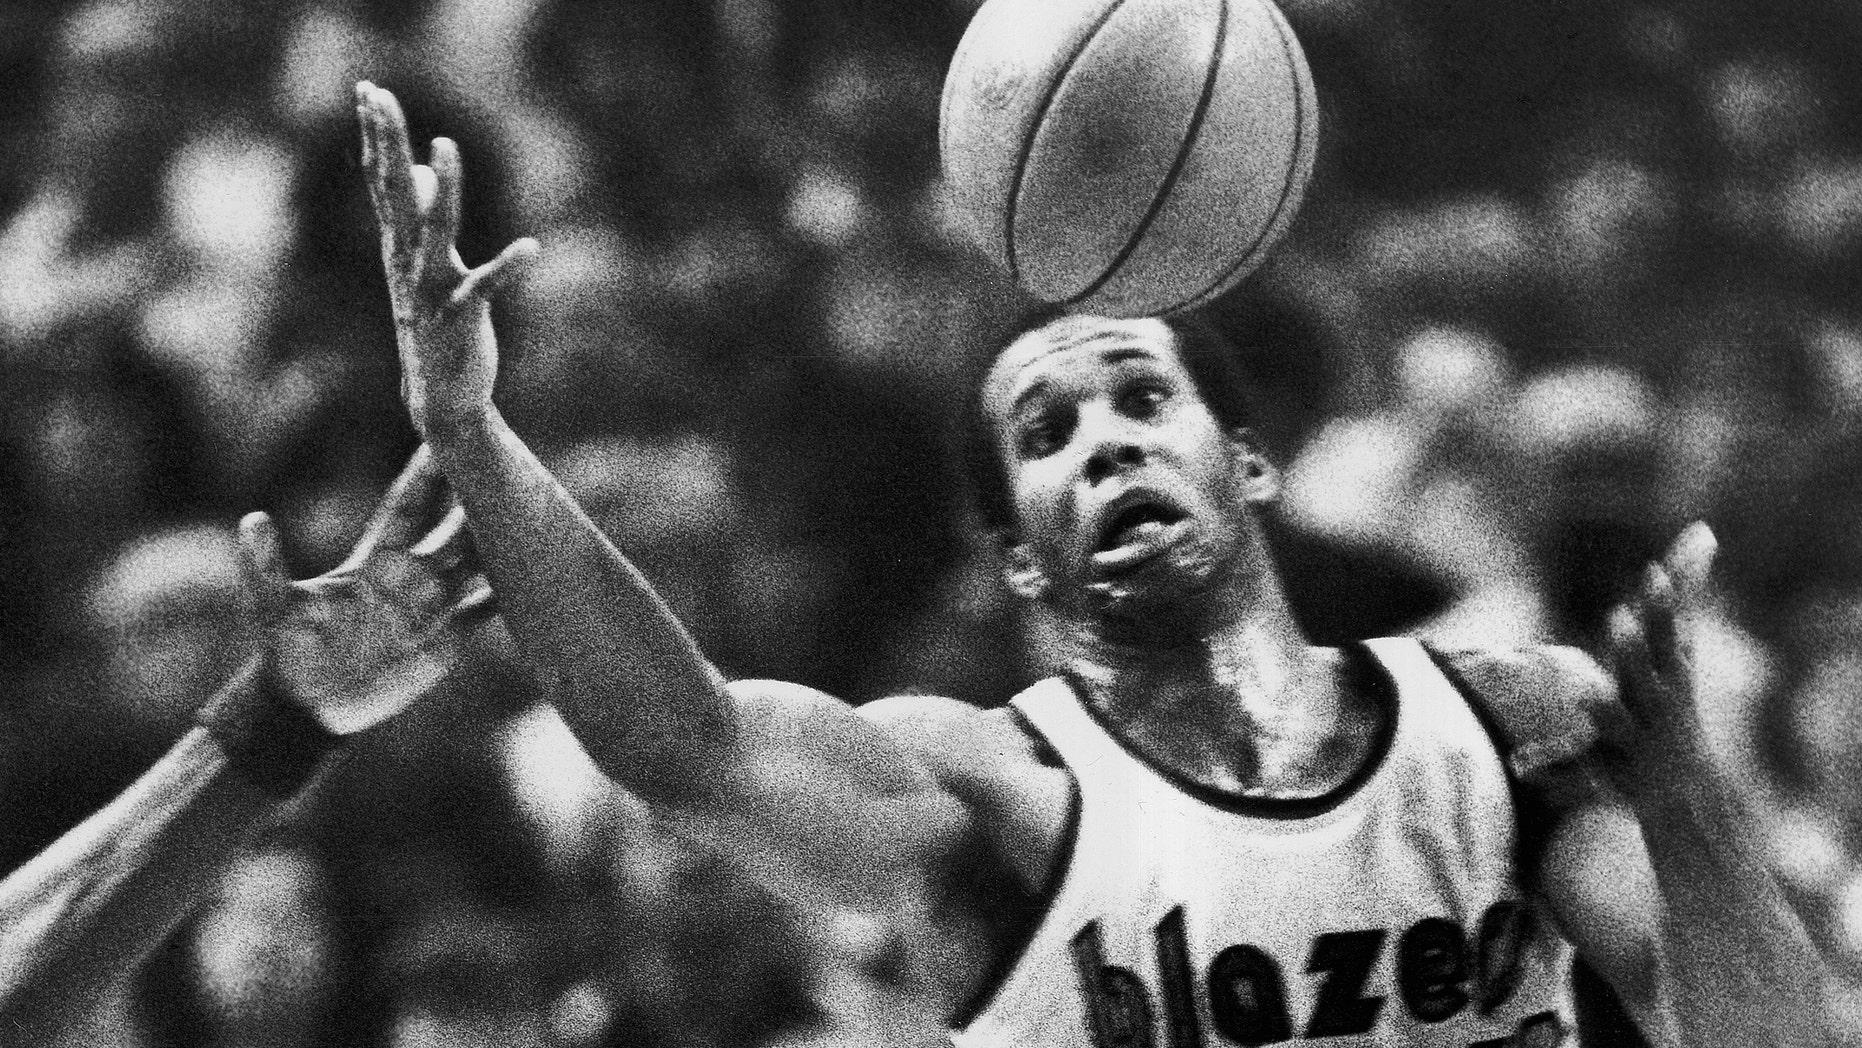 The Portland Trail Blazers' Kermit Washington gaining control of a loose ball in 1979.